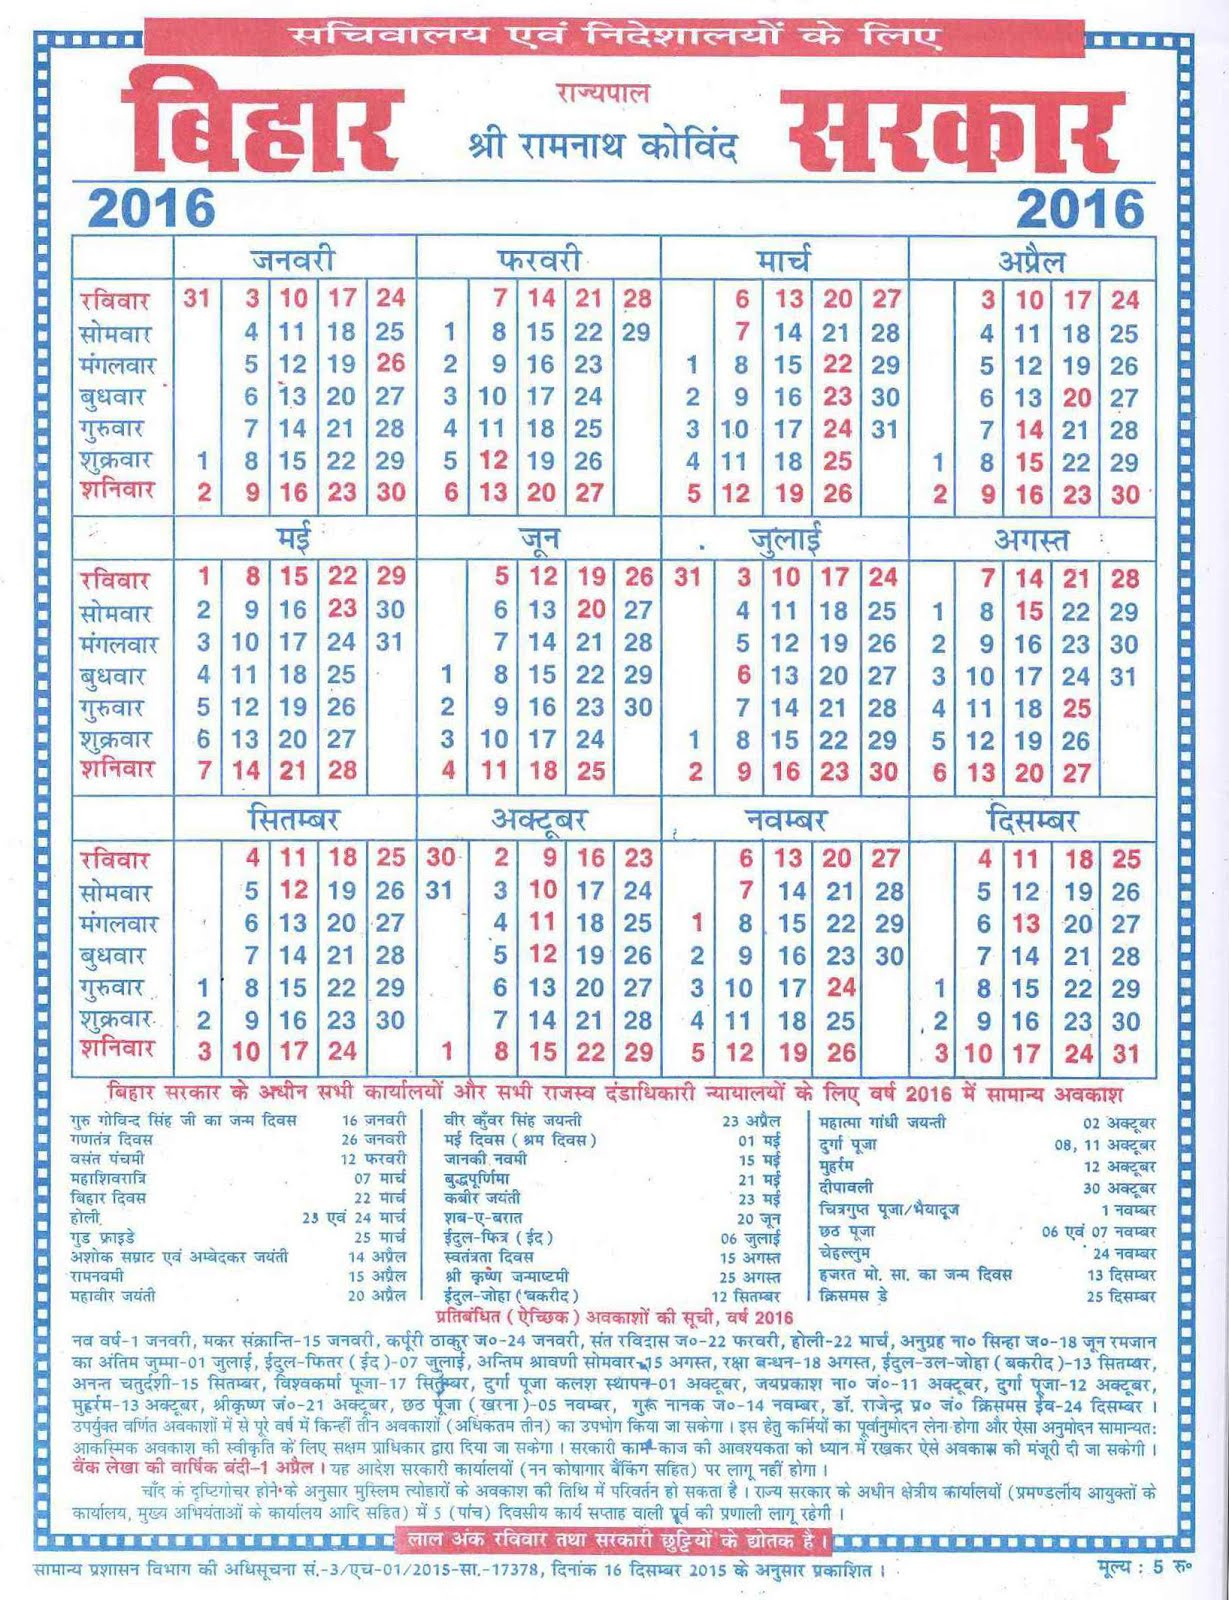 Bihar Government Calendar 2016 Download with regard to Bihar Govt. Calendar